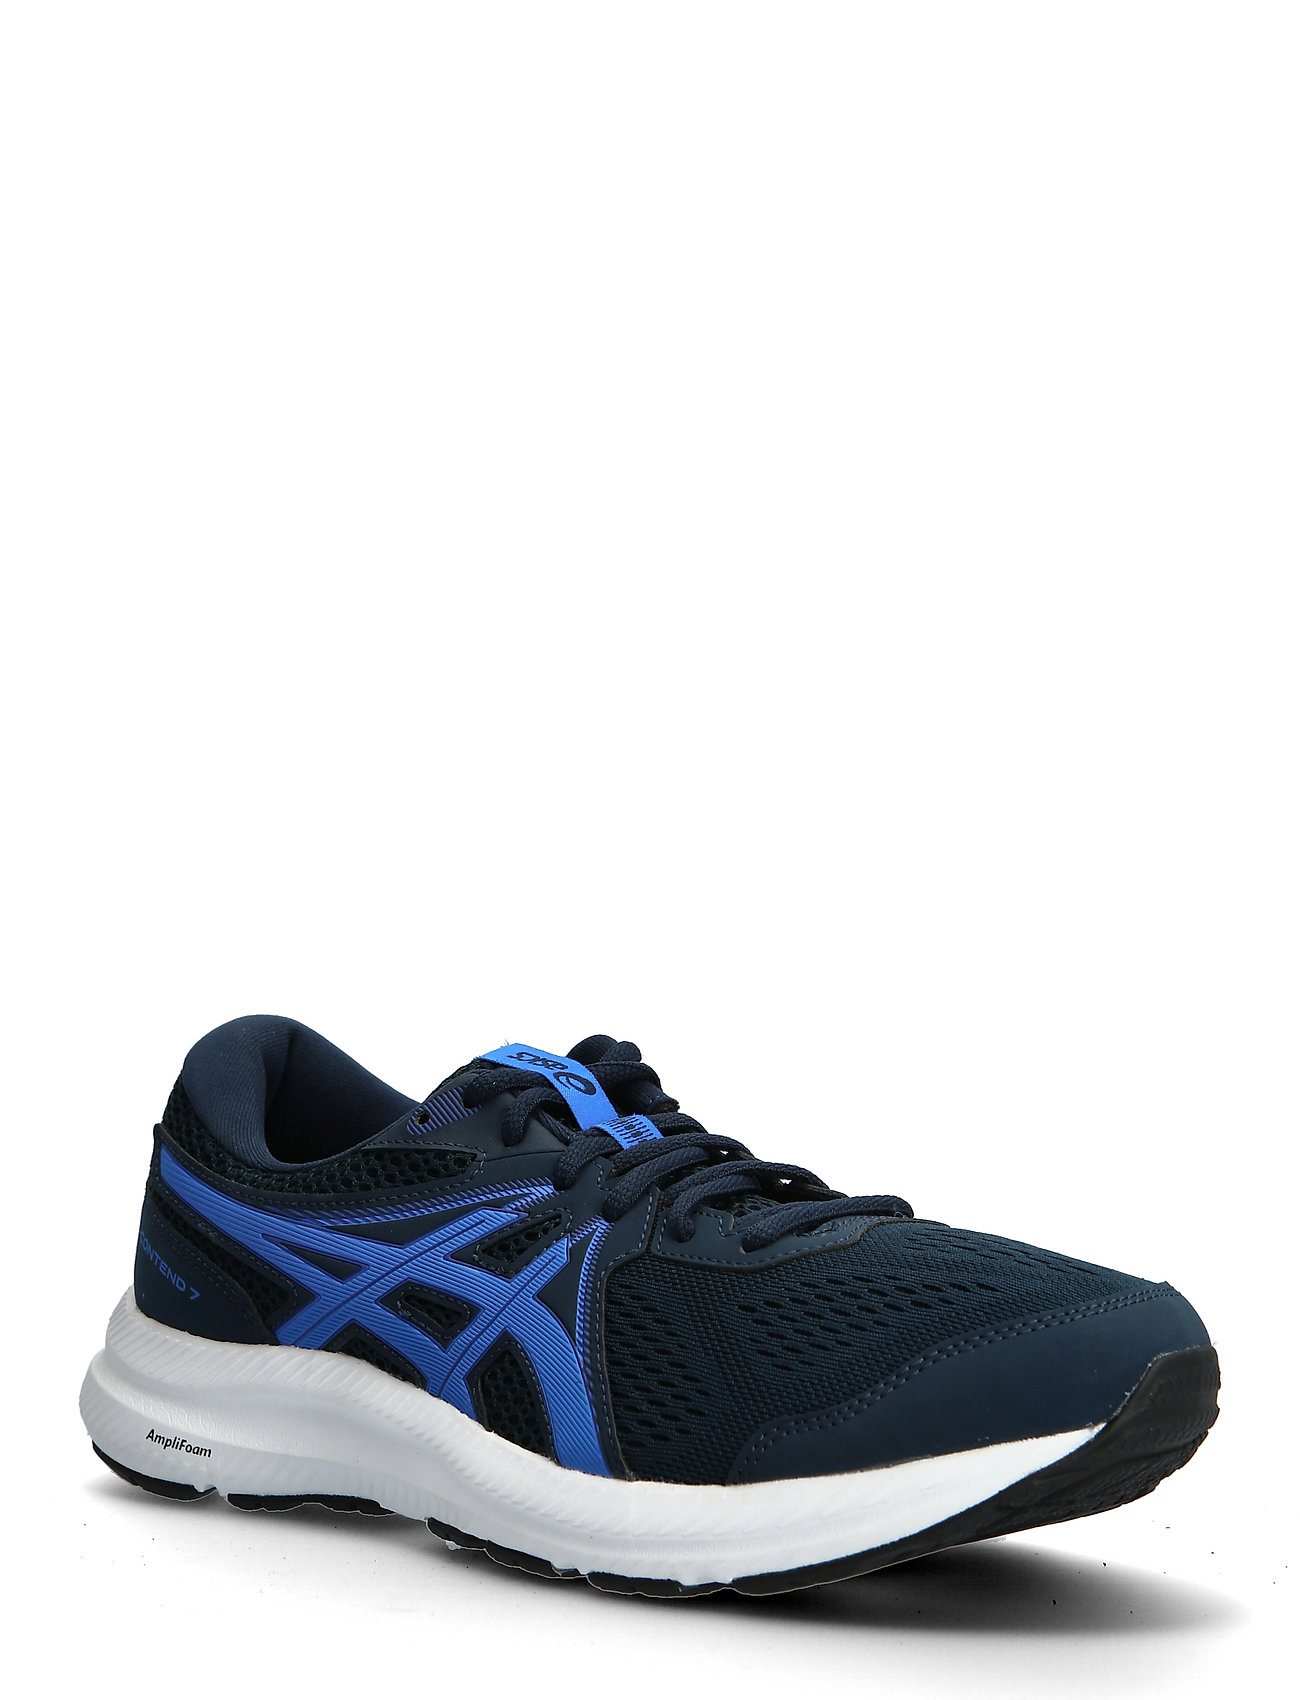 Gel-Contend 7 Shoes Sport Shoes Running Shoes Blå Asics